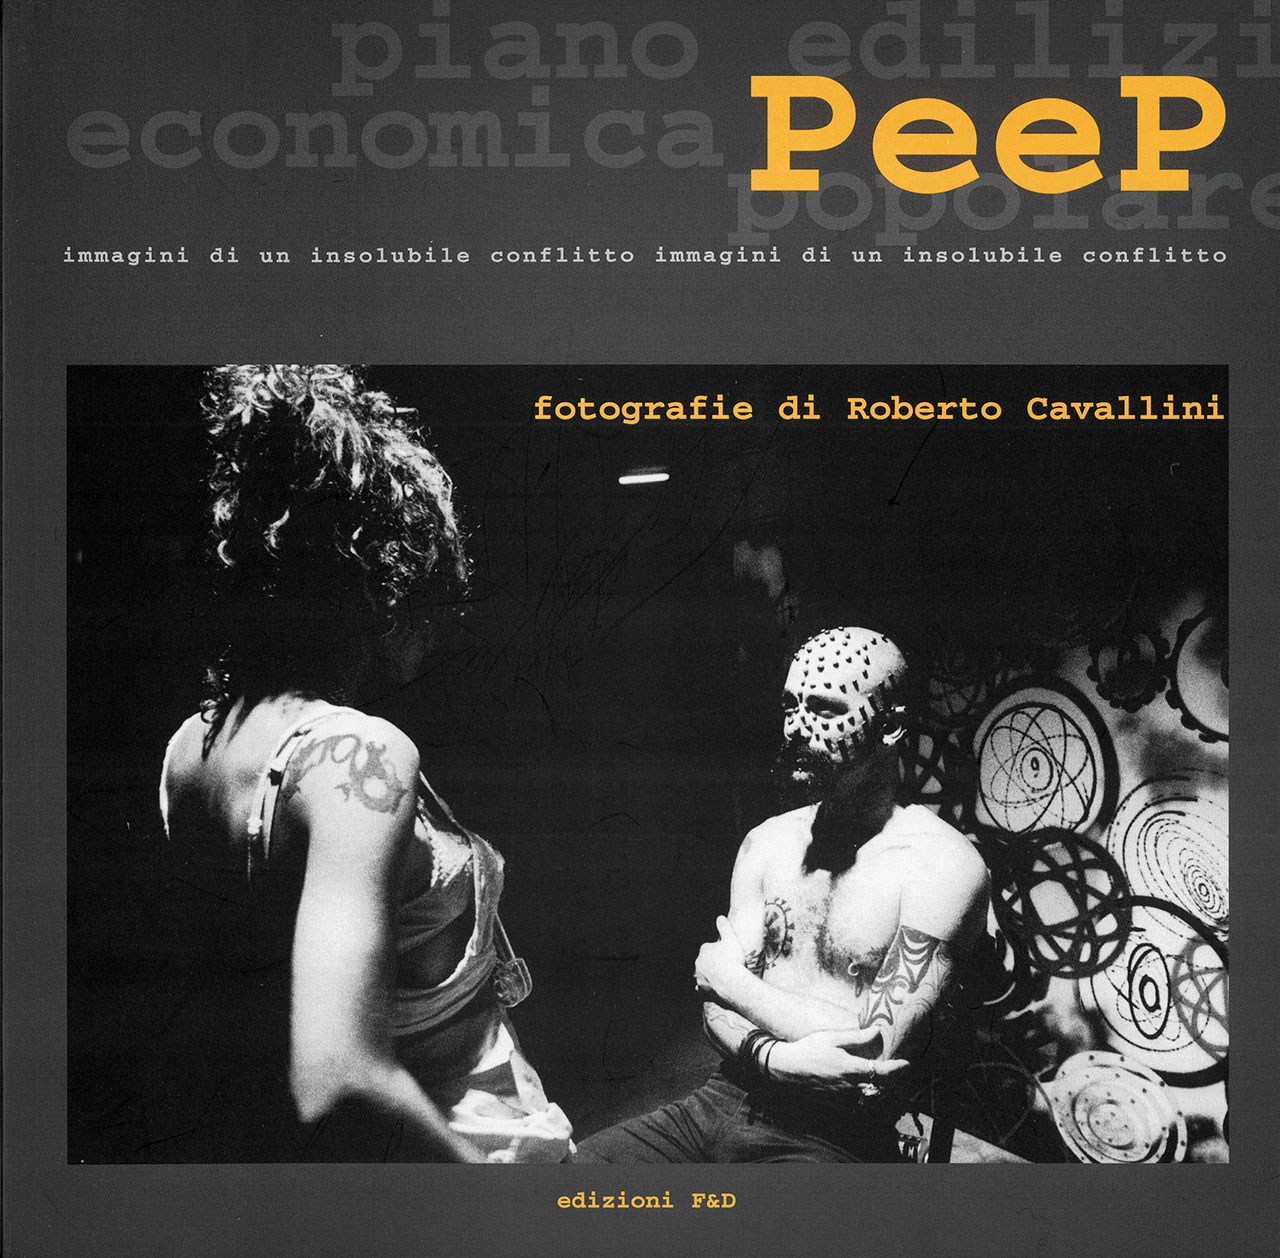 Copertina del volume PEEP, edizioni F&D, MIFAV, Università Tor Vergata, Roma settembre 1999